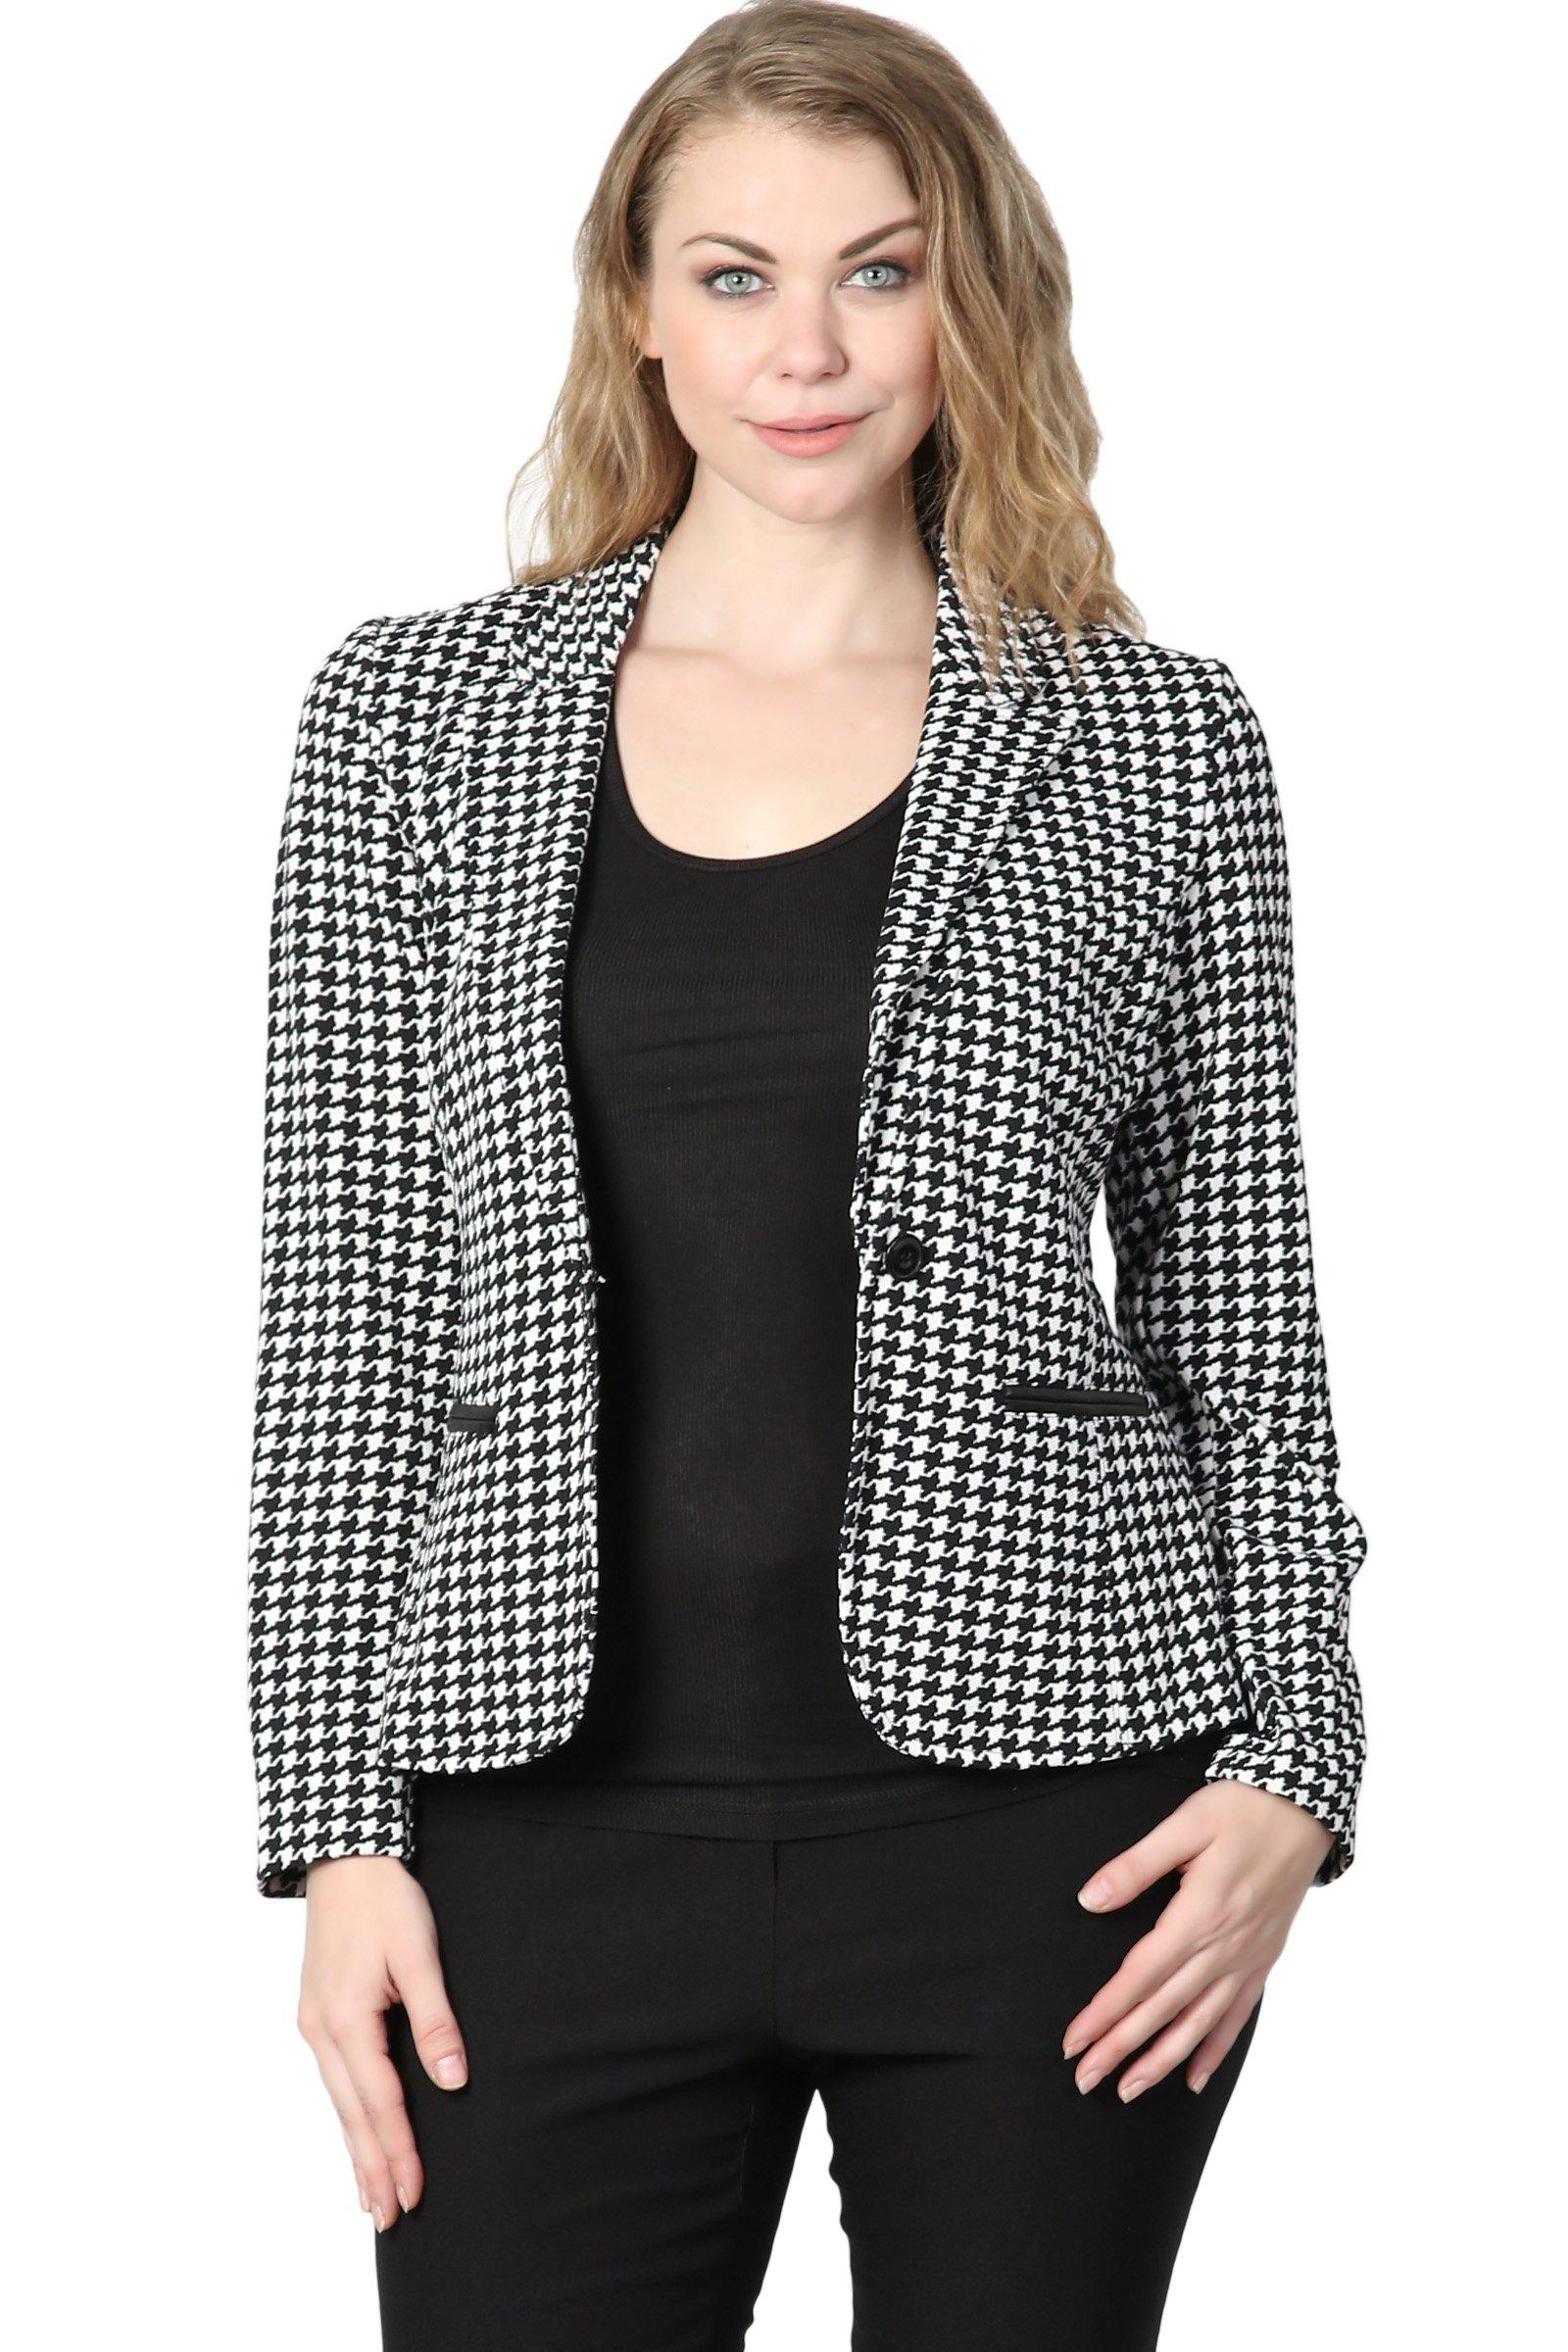 TheMogan Junior's Checker Faux Leather Pocket Slim Fit Blazer Jacket Black 1XL by TheMogan (Image #1)